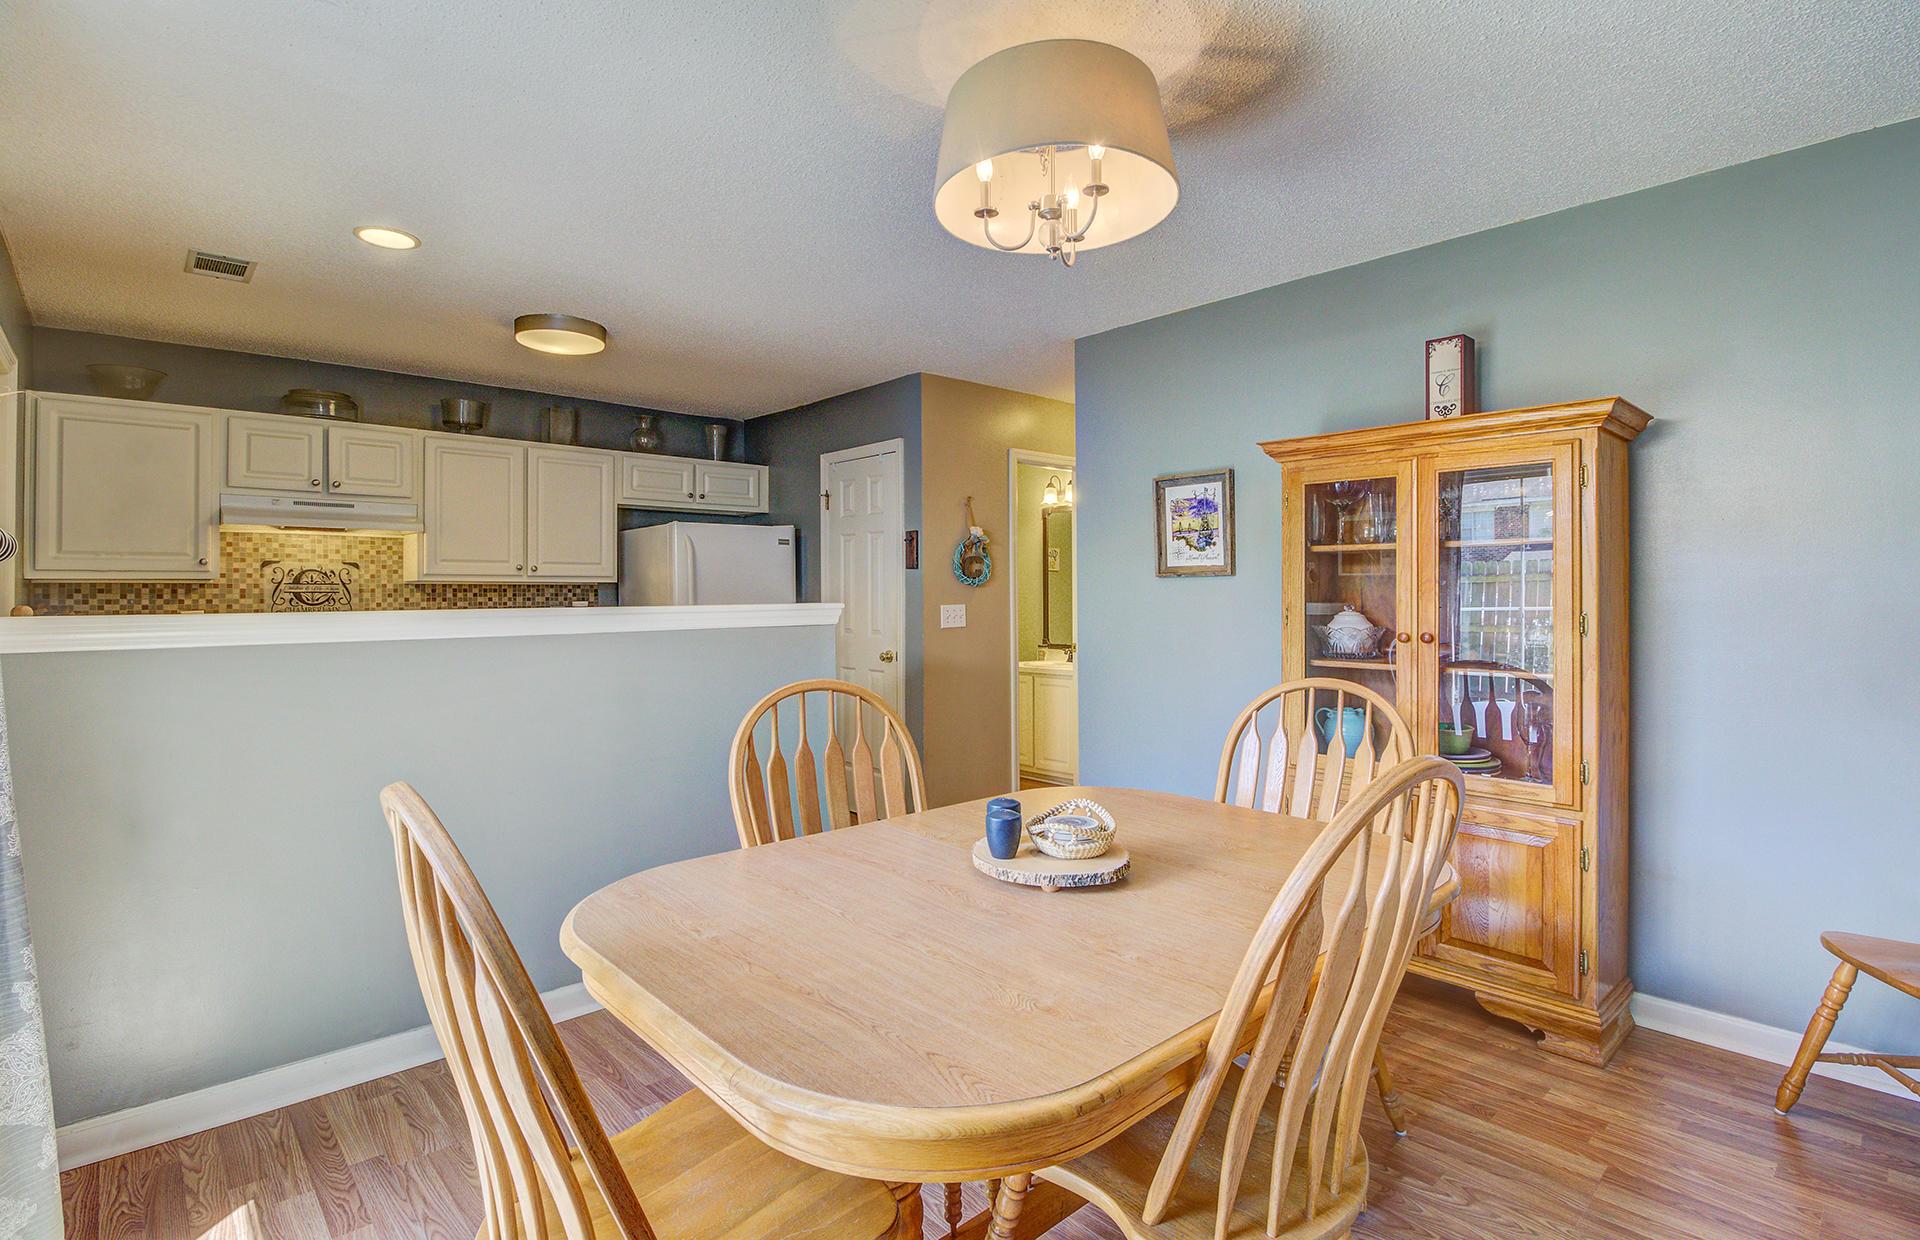 Wando East Homes For Sale - 1664 Hunters Run, Mount Pleasant, SC - 19